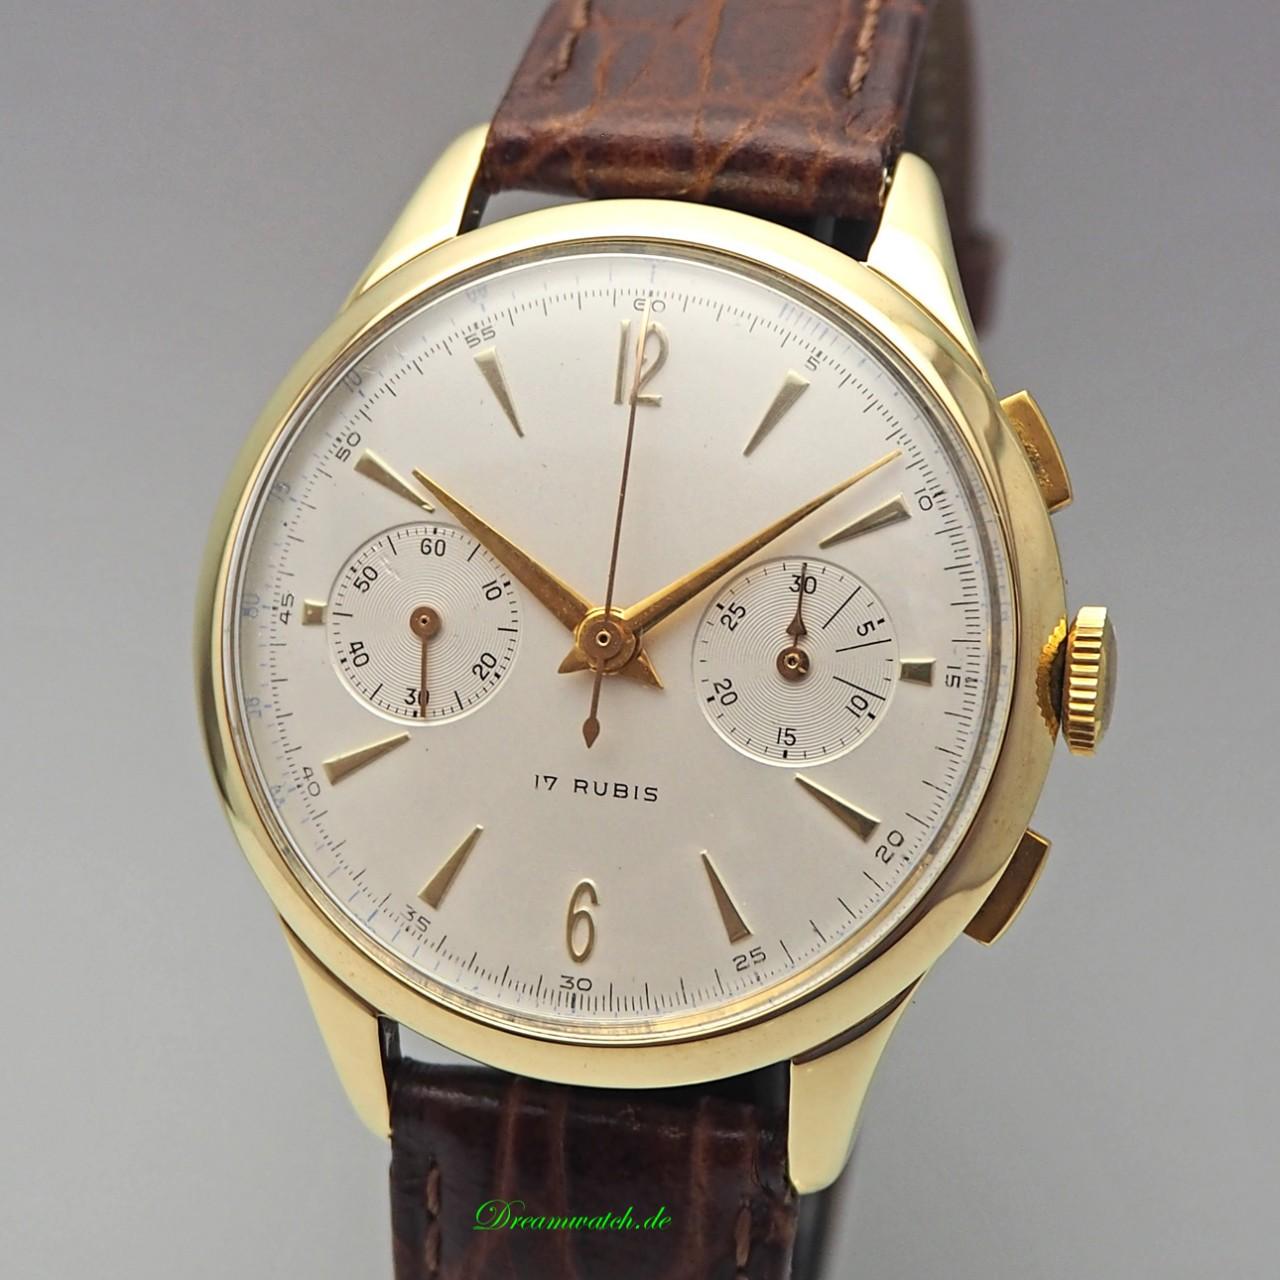 Le Phare Chronograph Vintage Handaufzug Londeron